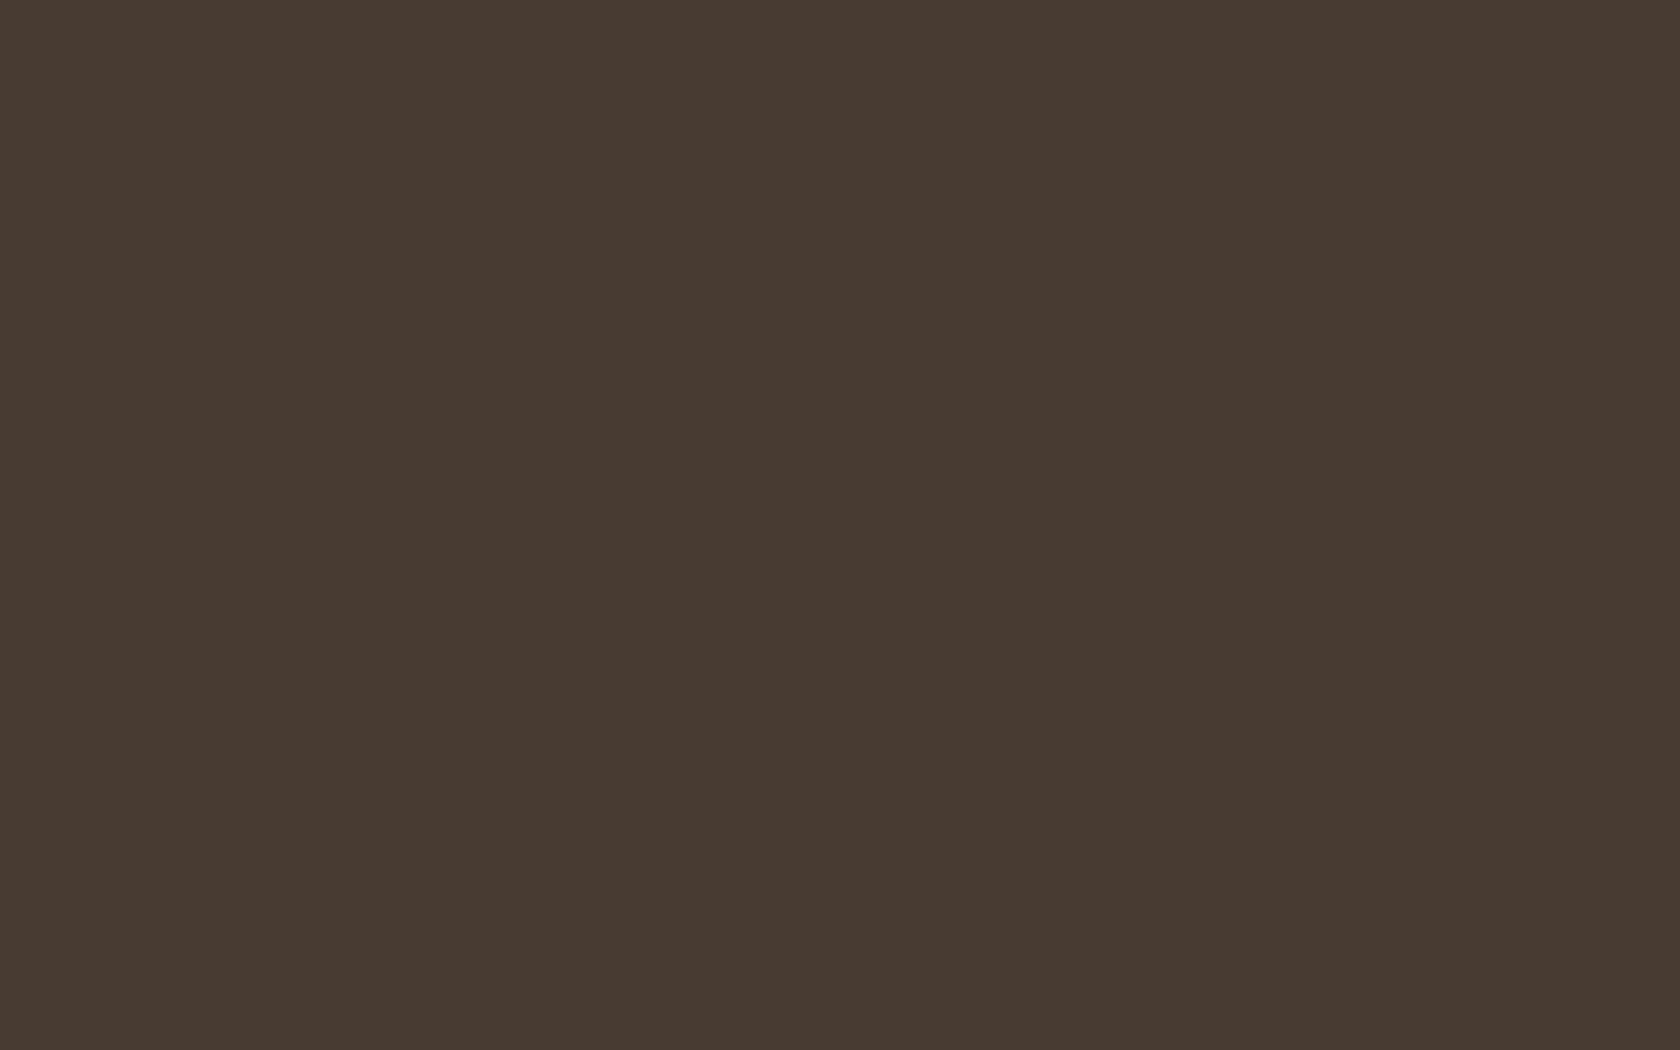 1680x1050 Dark Lava Solid Color Background